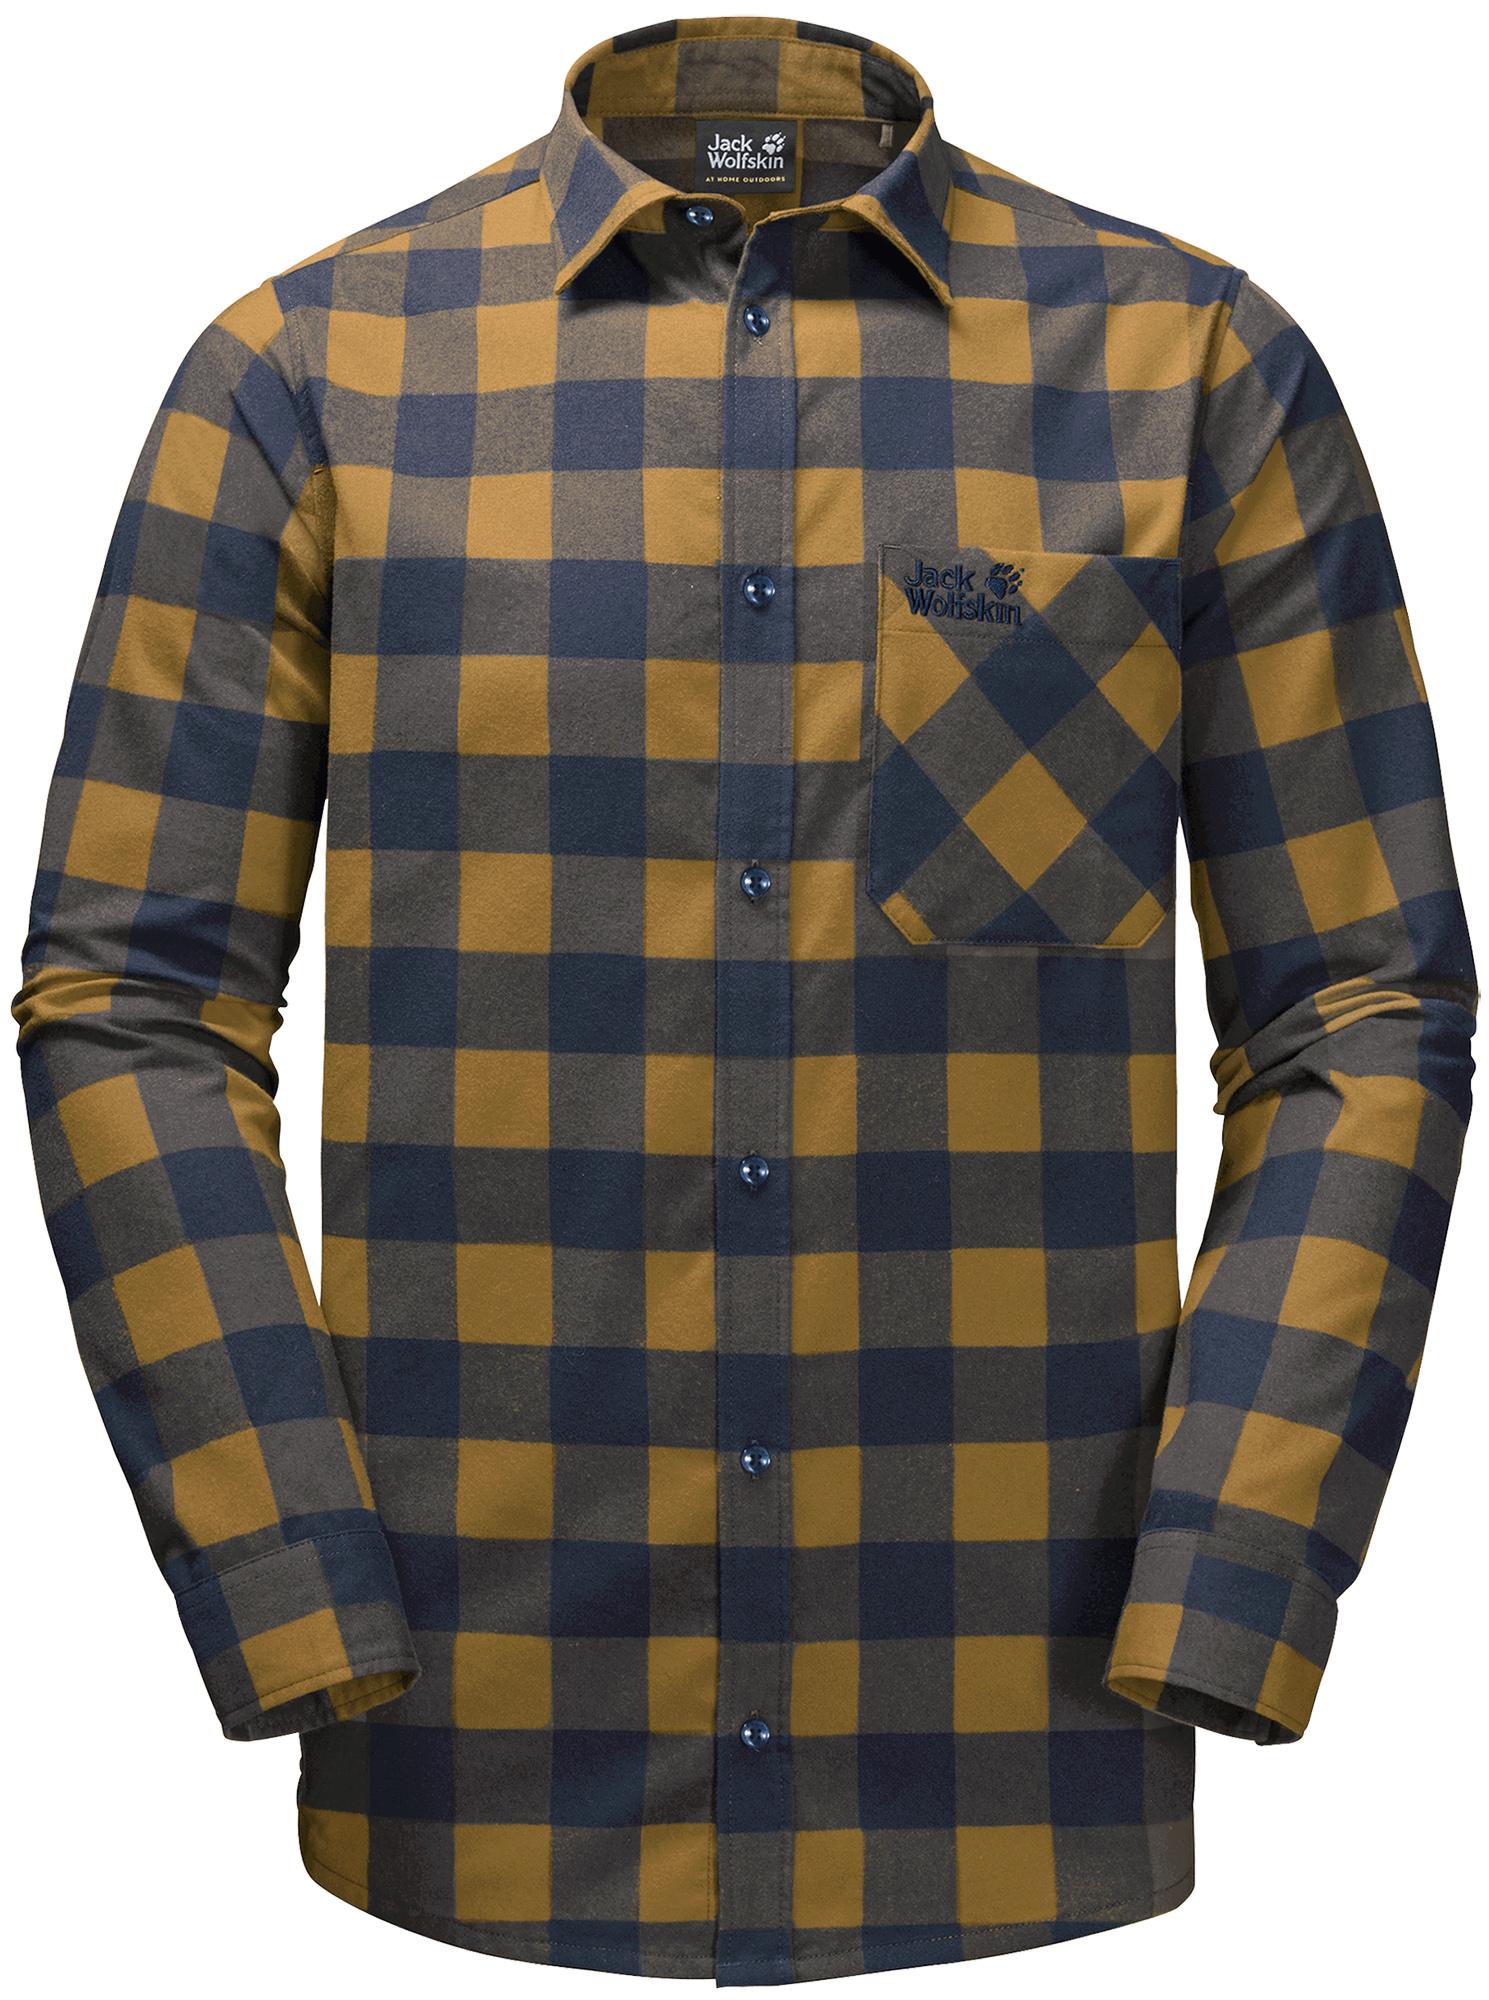 JACK WOLFSKIN Рубашка мужская Jack Wolfskin Red River, размер 58